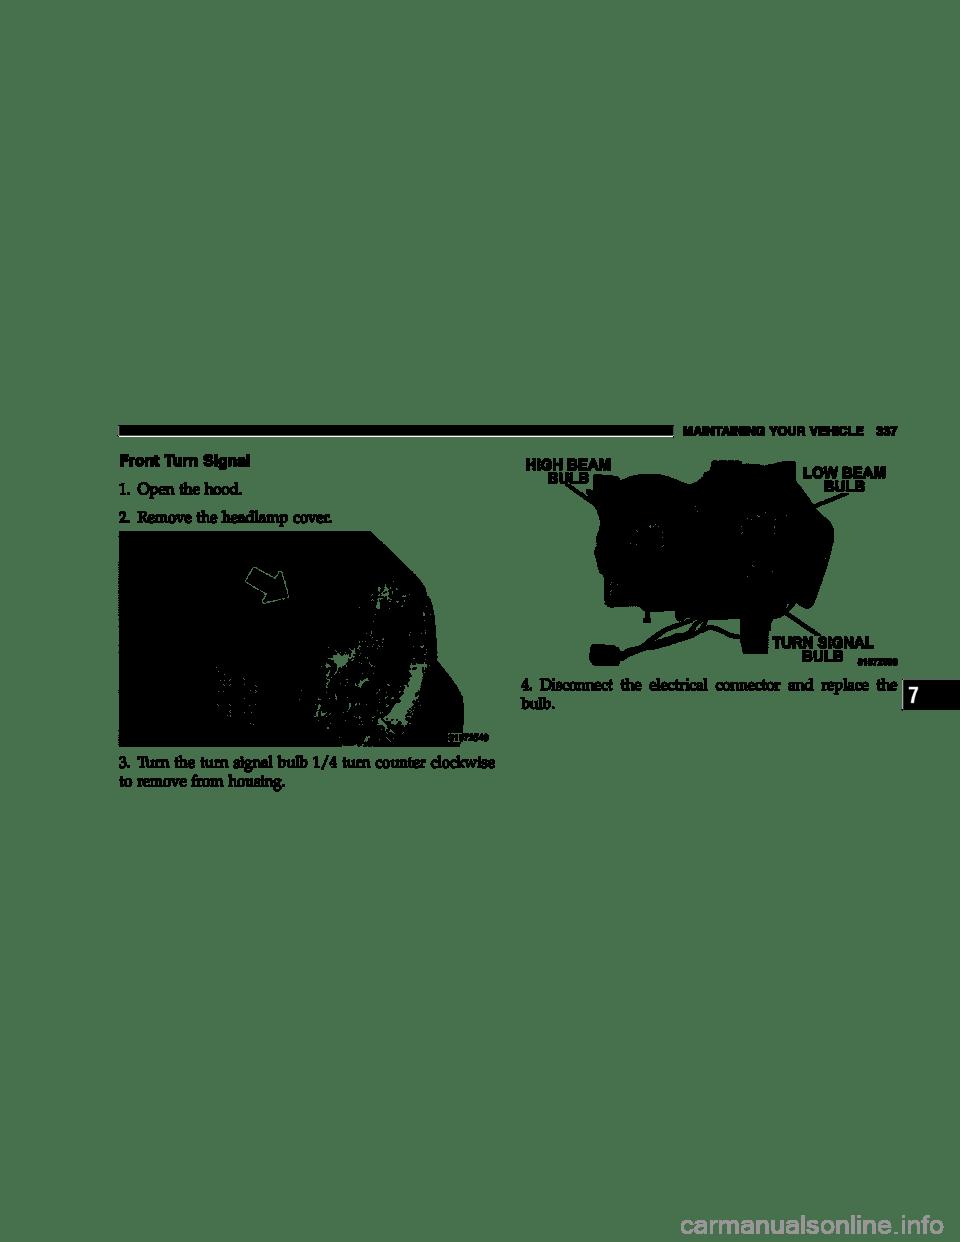 medium resolution of fuse box diagram 2006 jeep grand cherokee wk